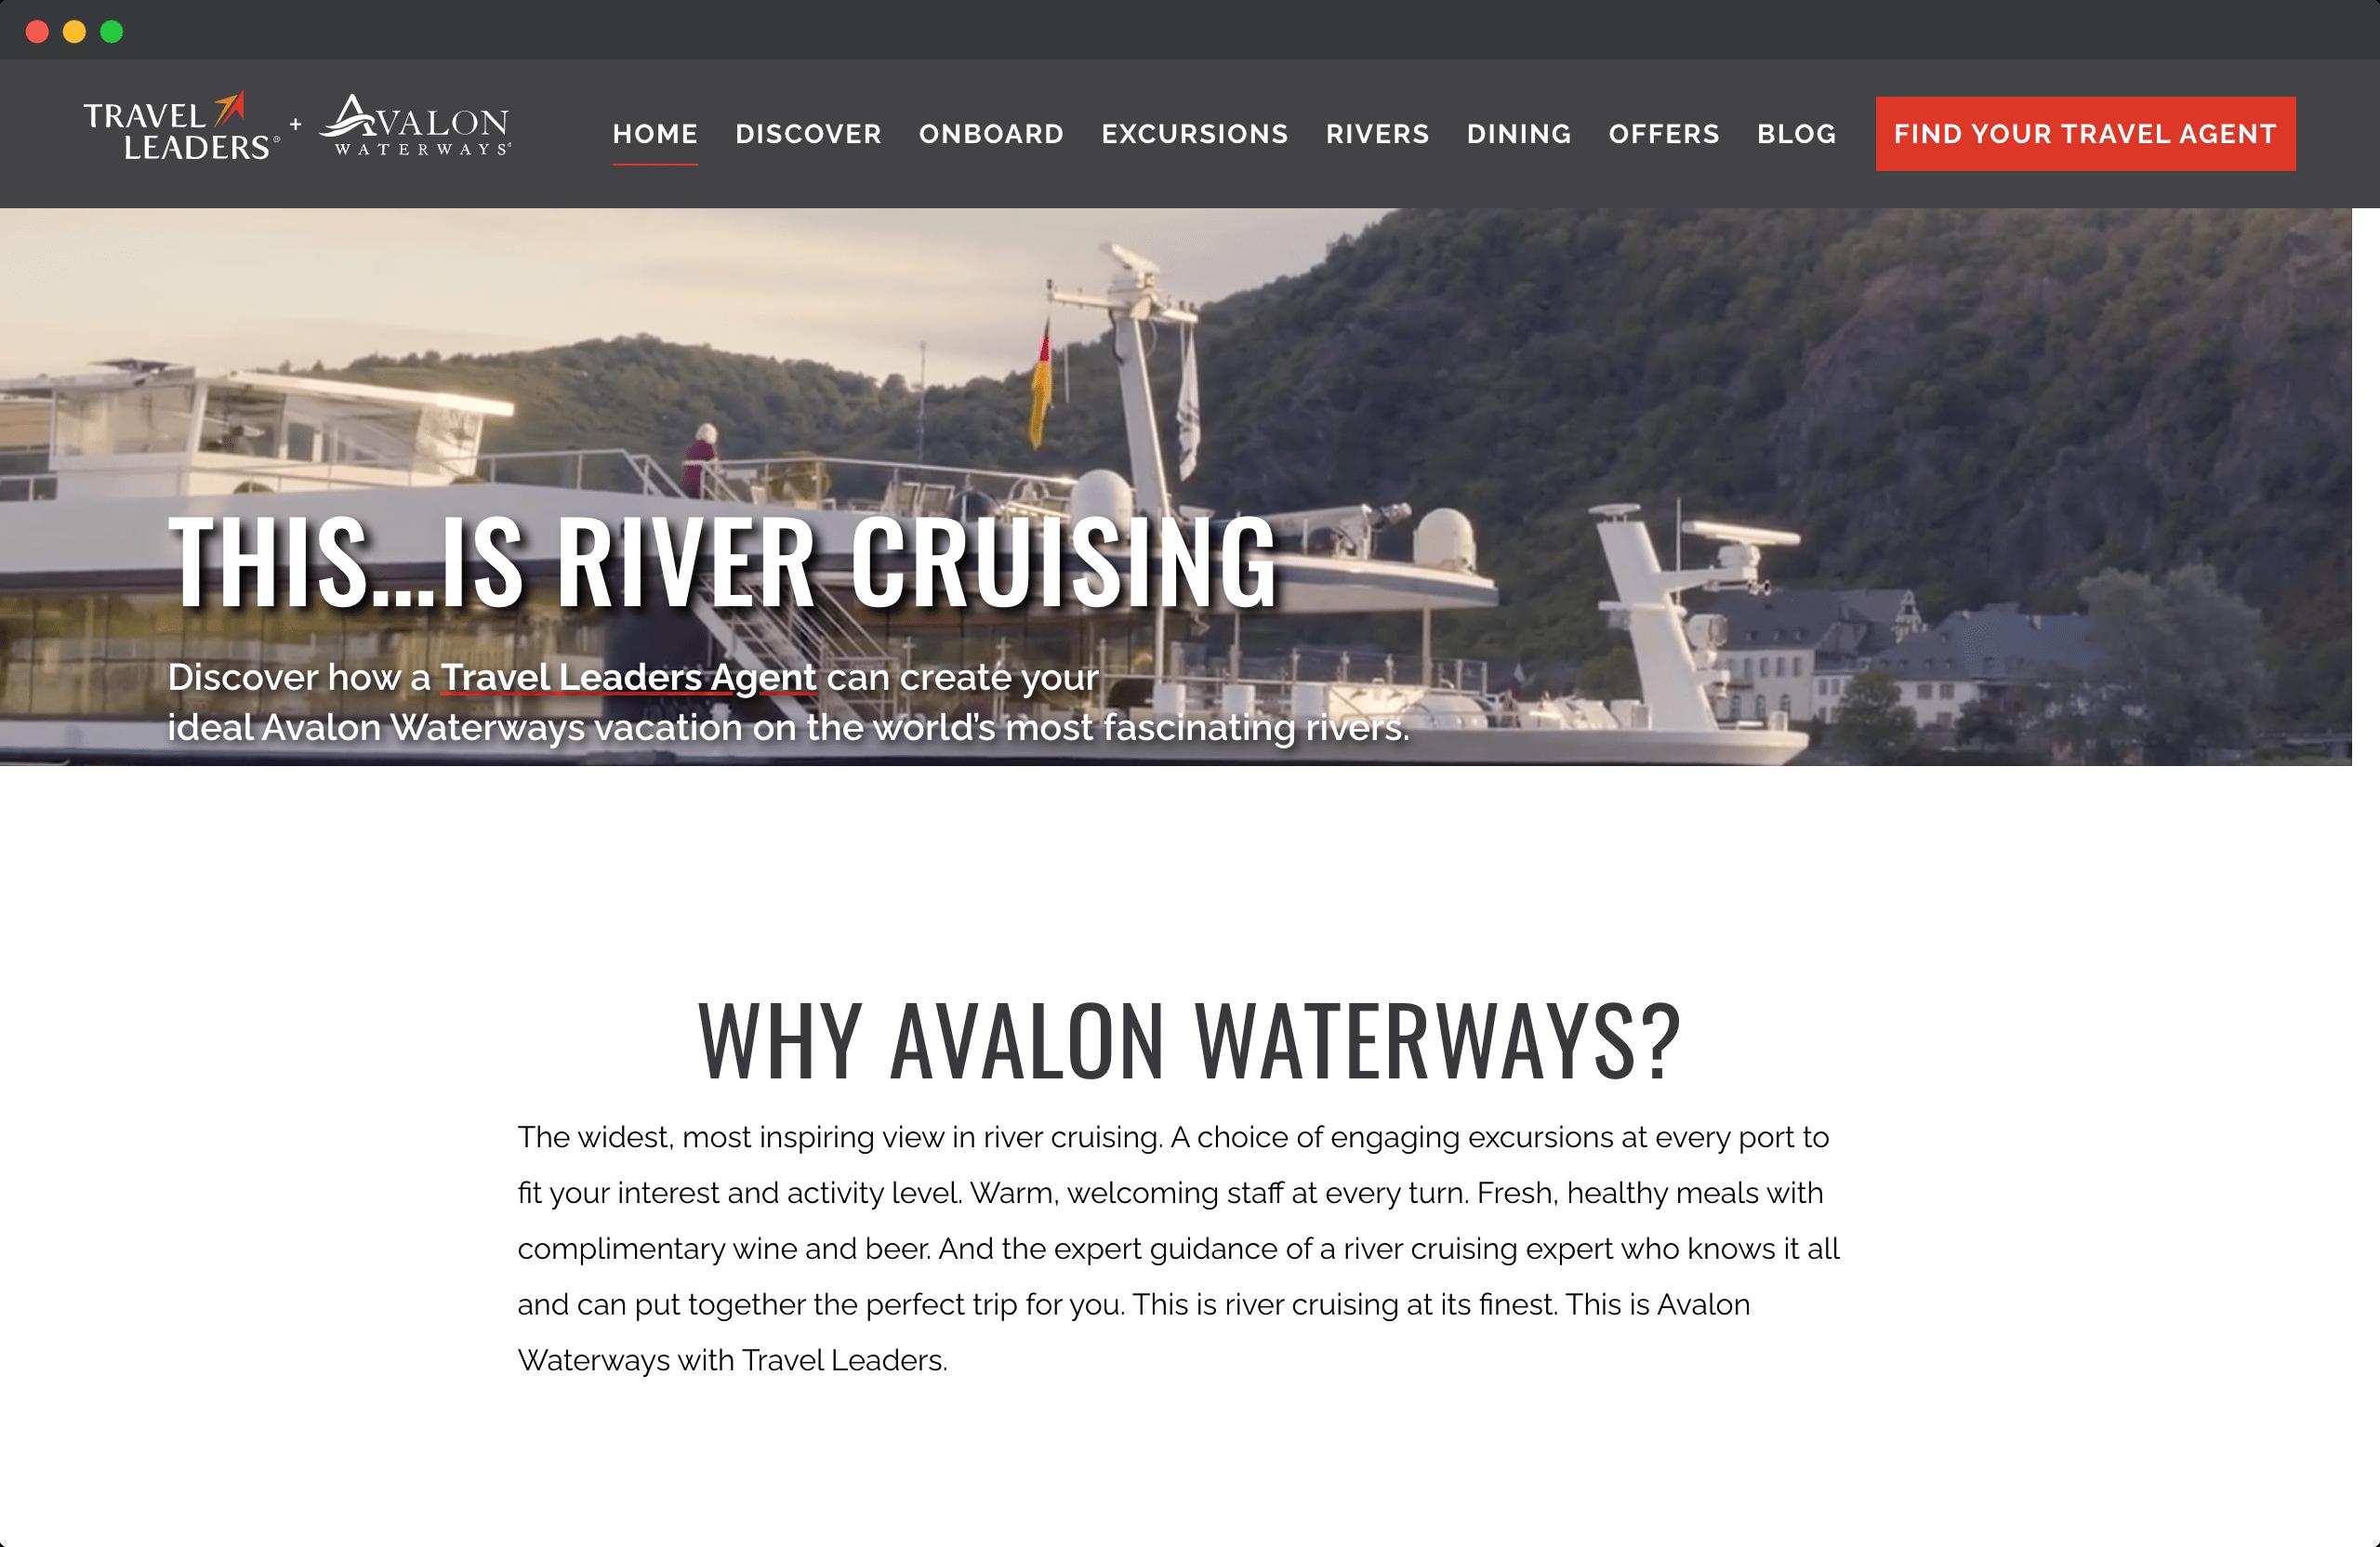 Avalon Waterways: This is River Cruising